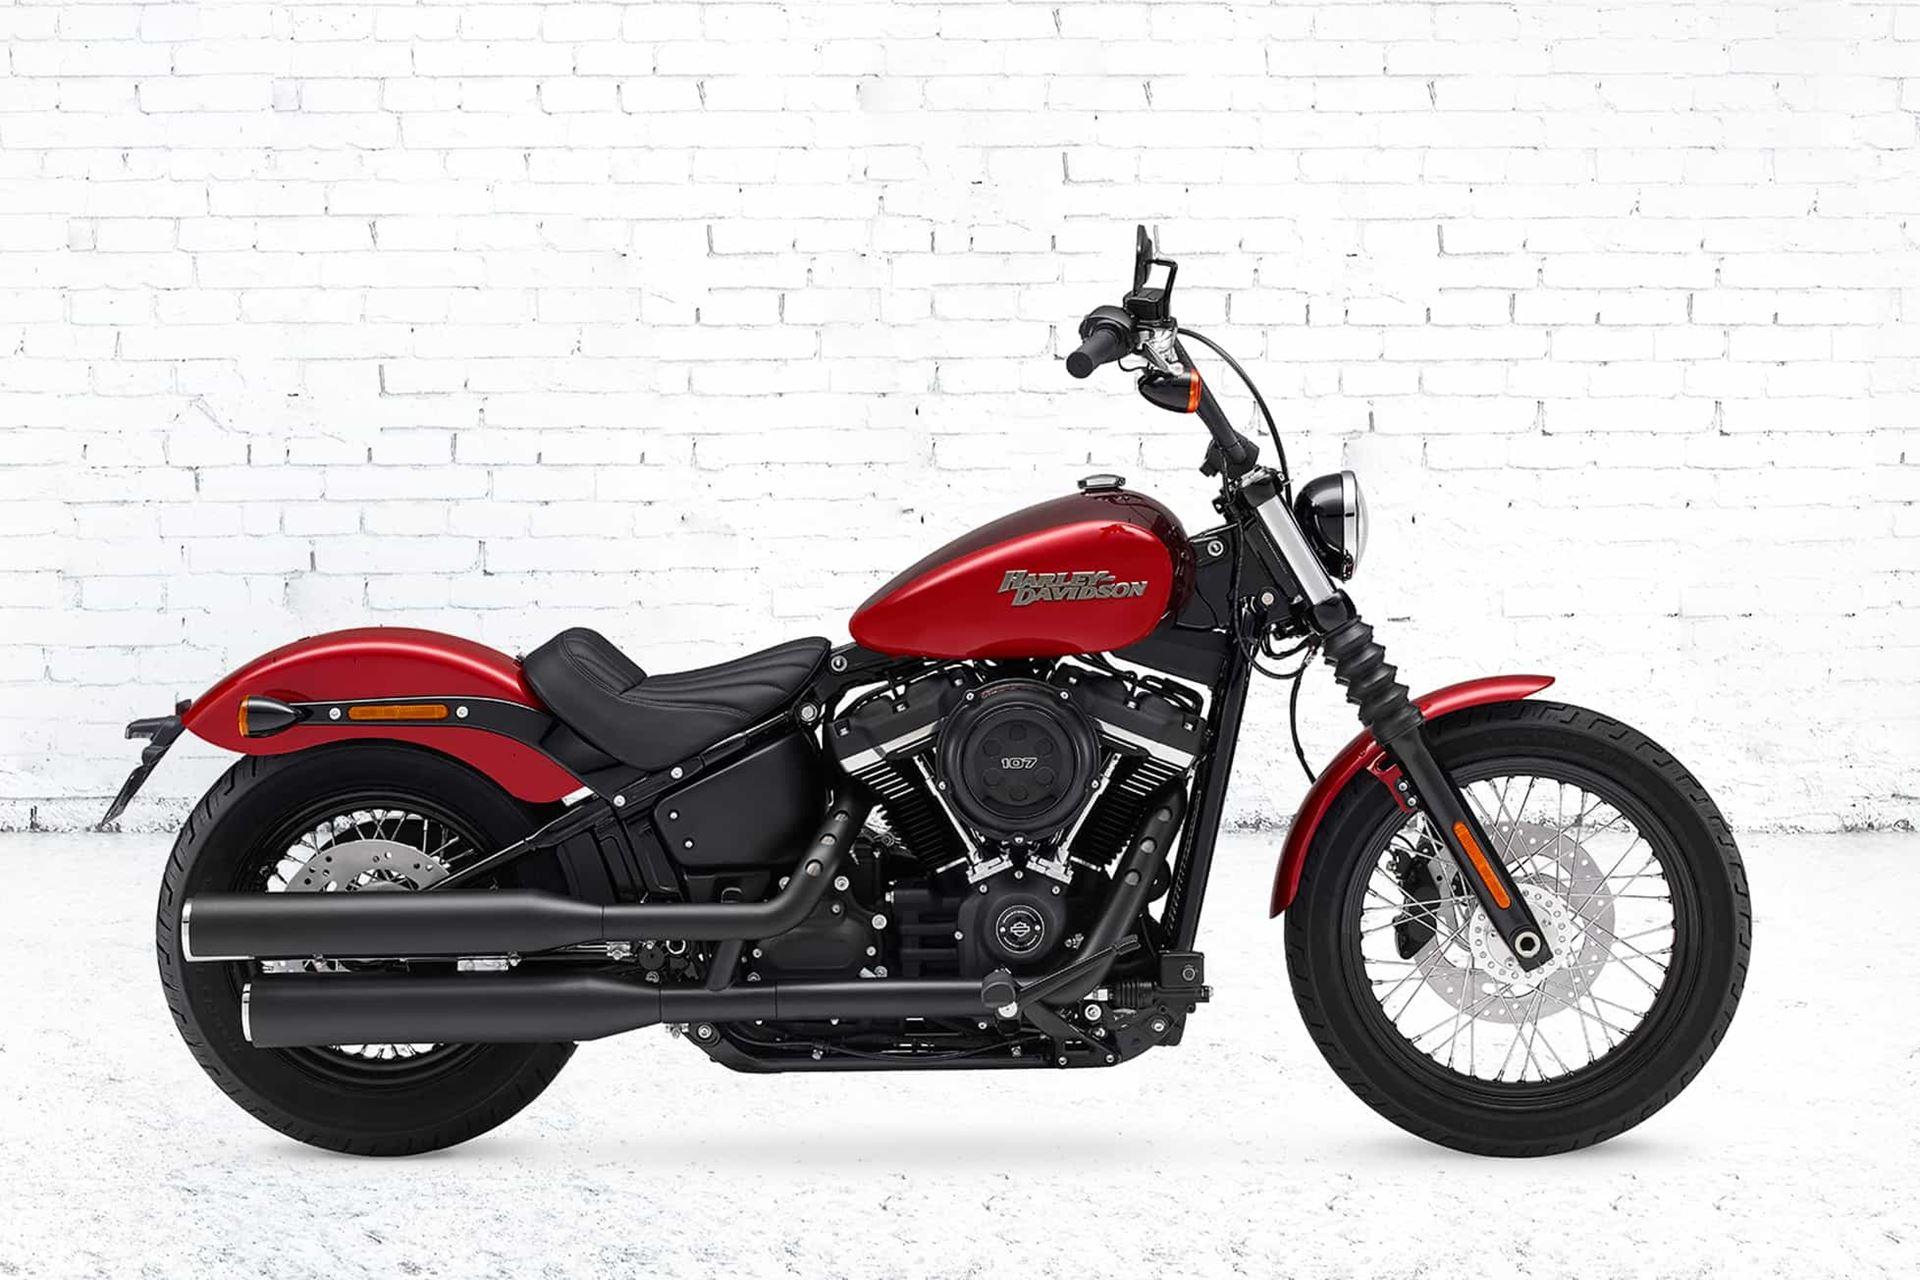 harley davidson street bob moto softail andar de moto. Black Bedroom Furniture Sets. Home Design Ideas